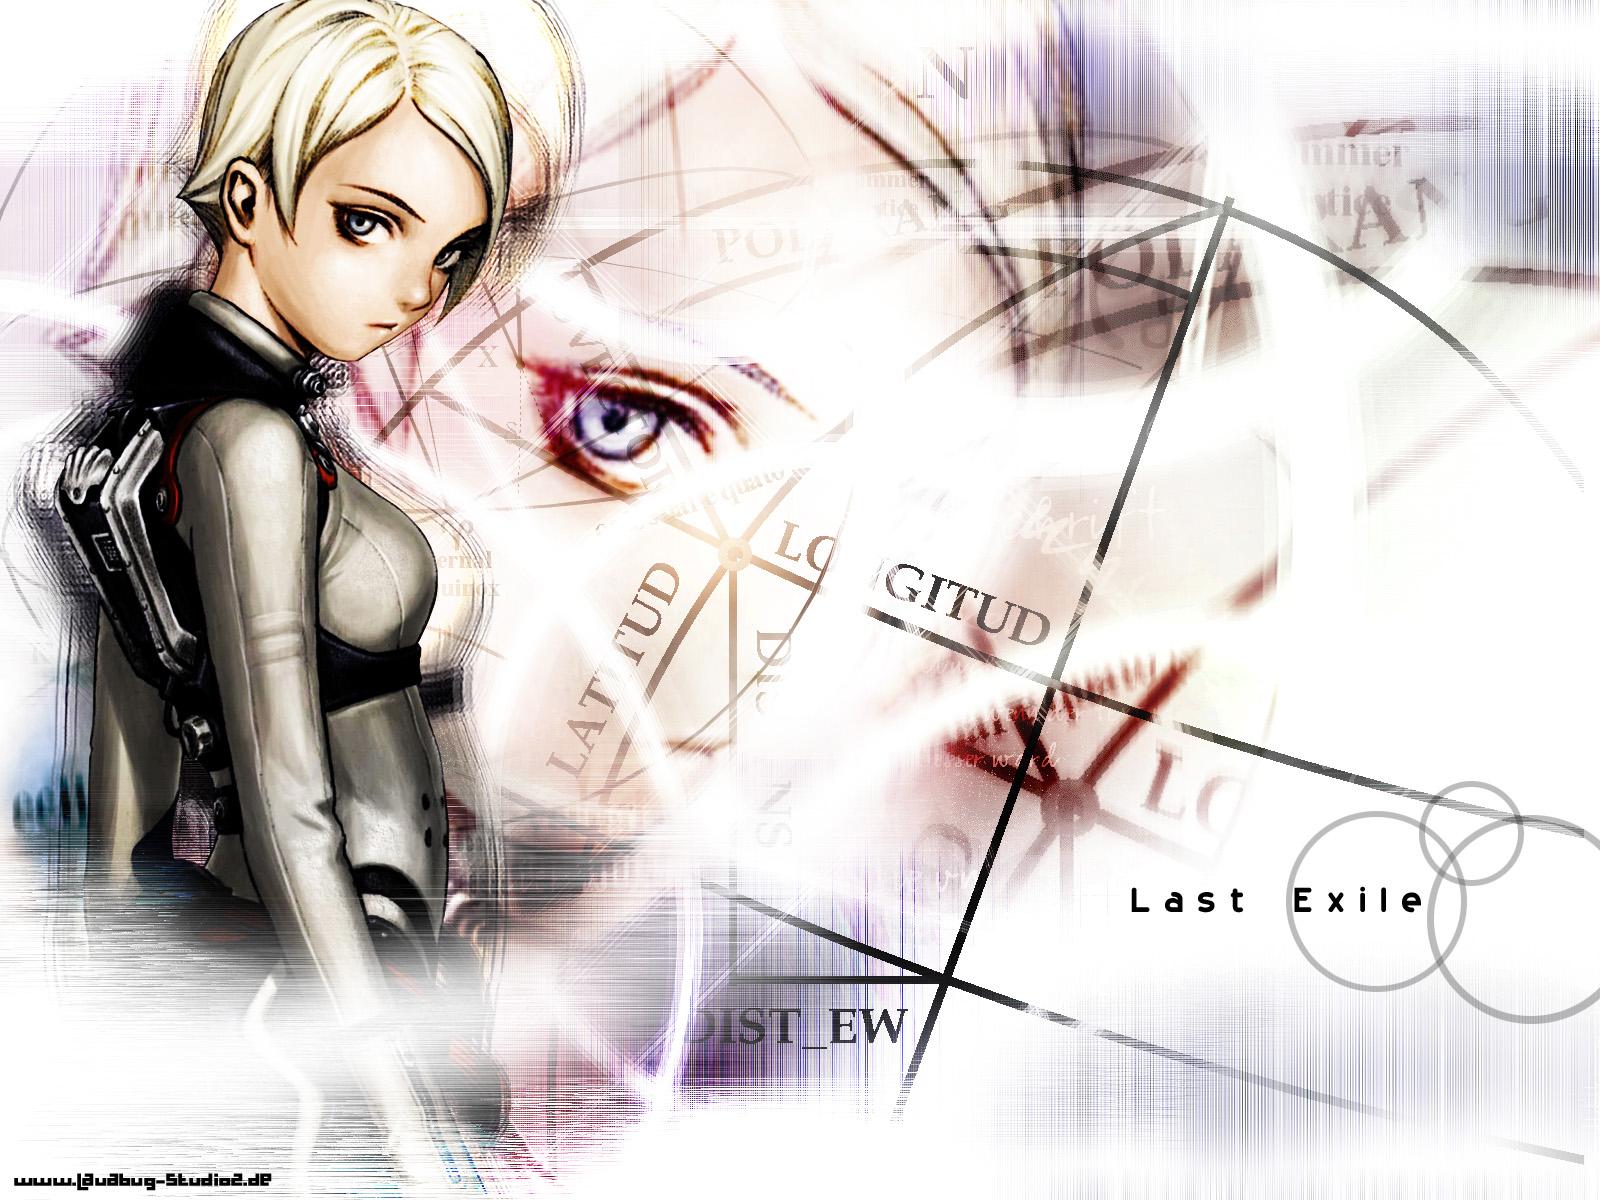 Gebujitos Anime HD Wallpaper July 2011 1600x1200